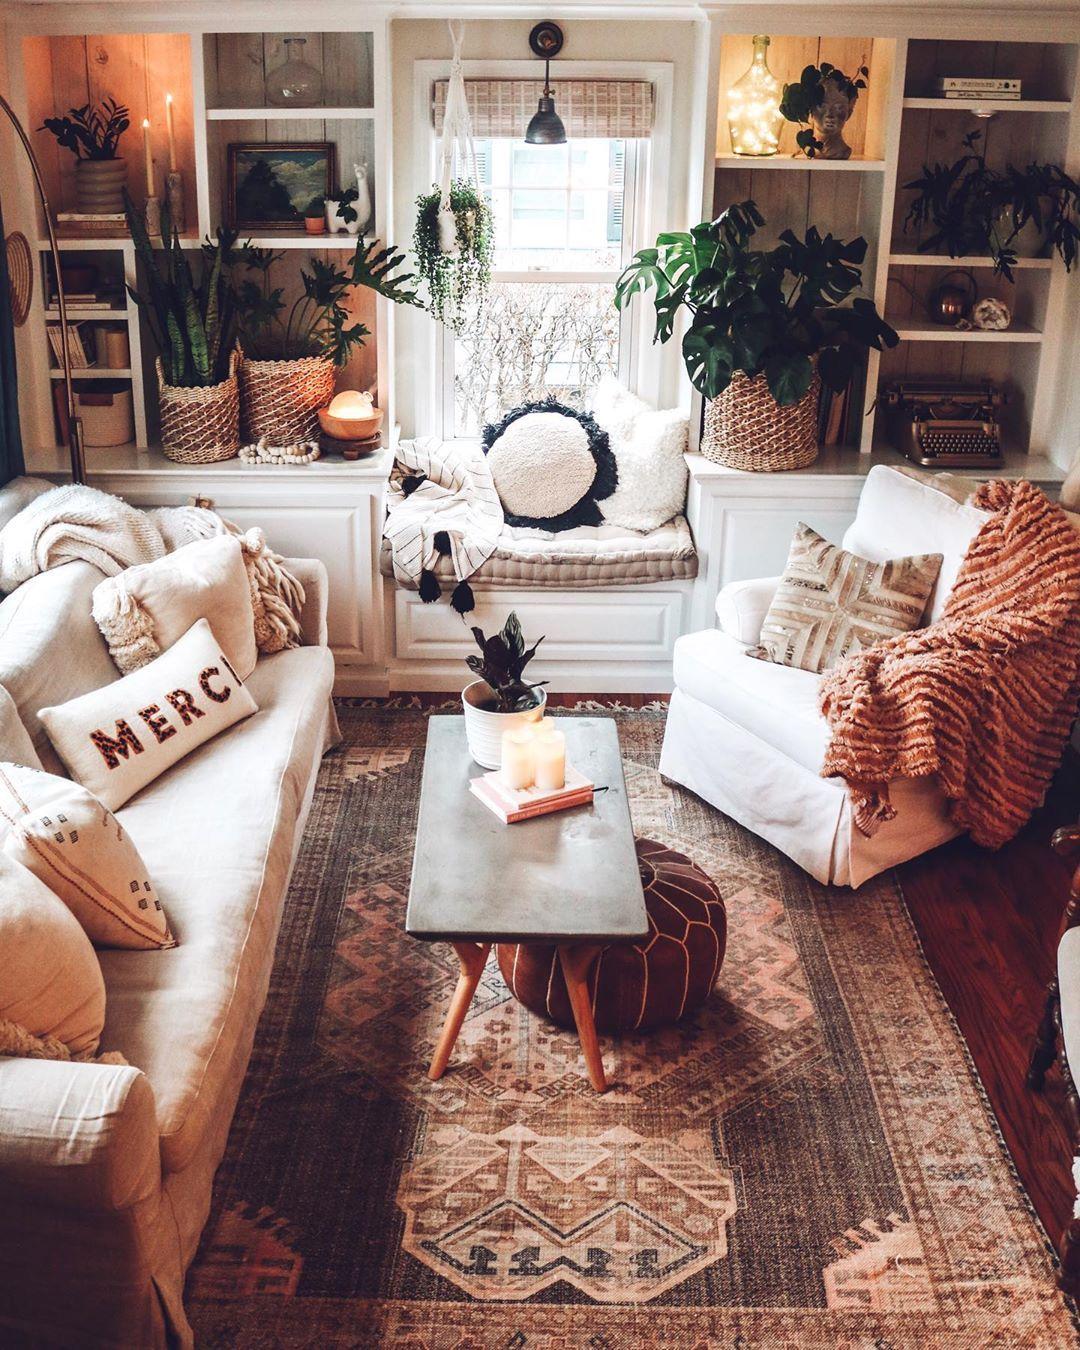 Brooke Christen On Instagram January Living Room Look I Actually Wasn T Feeling Inspired To Take Down Chri Living Room Warm Home Decor Hygge Living Room